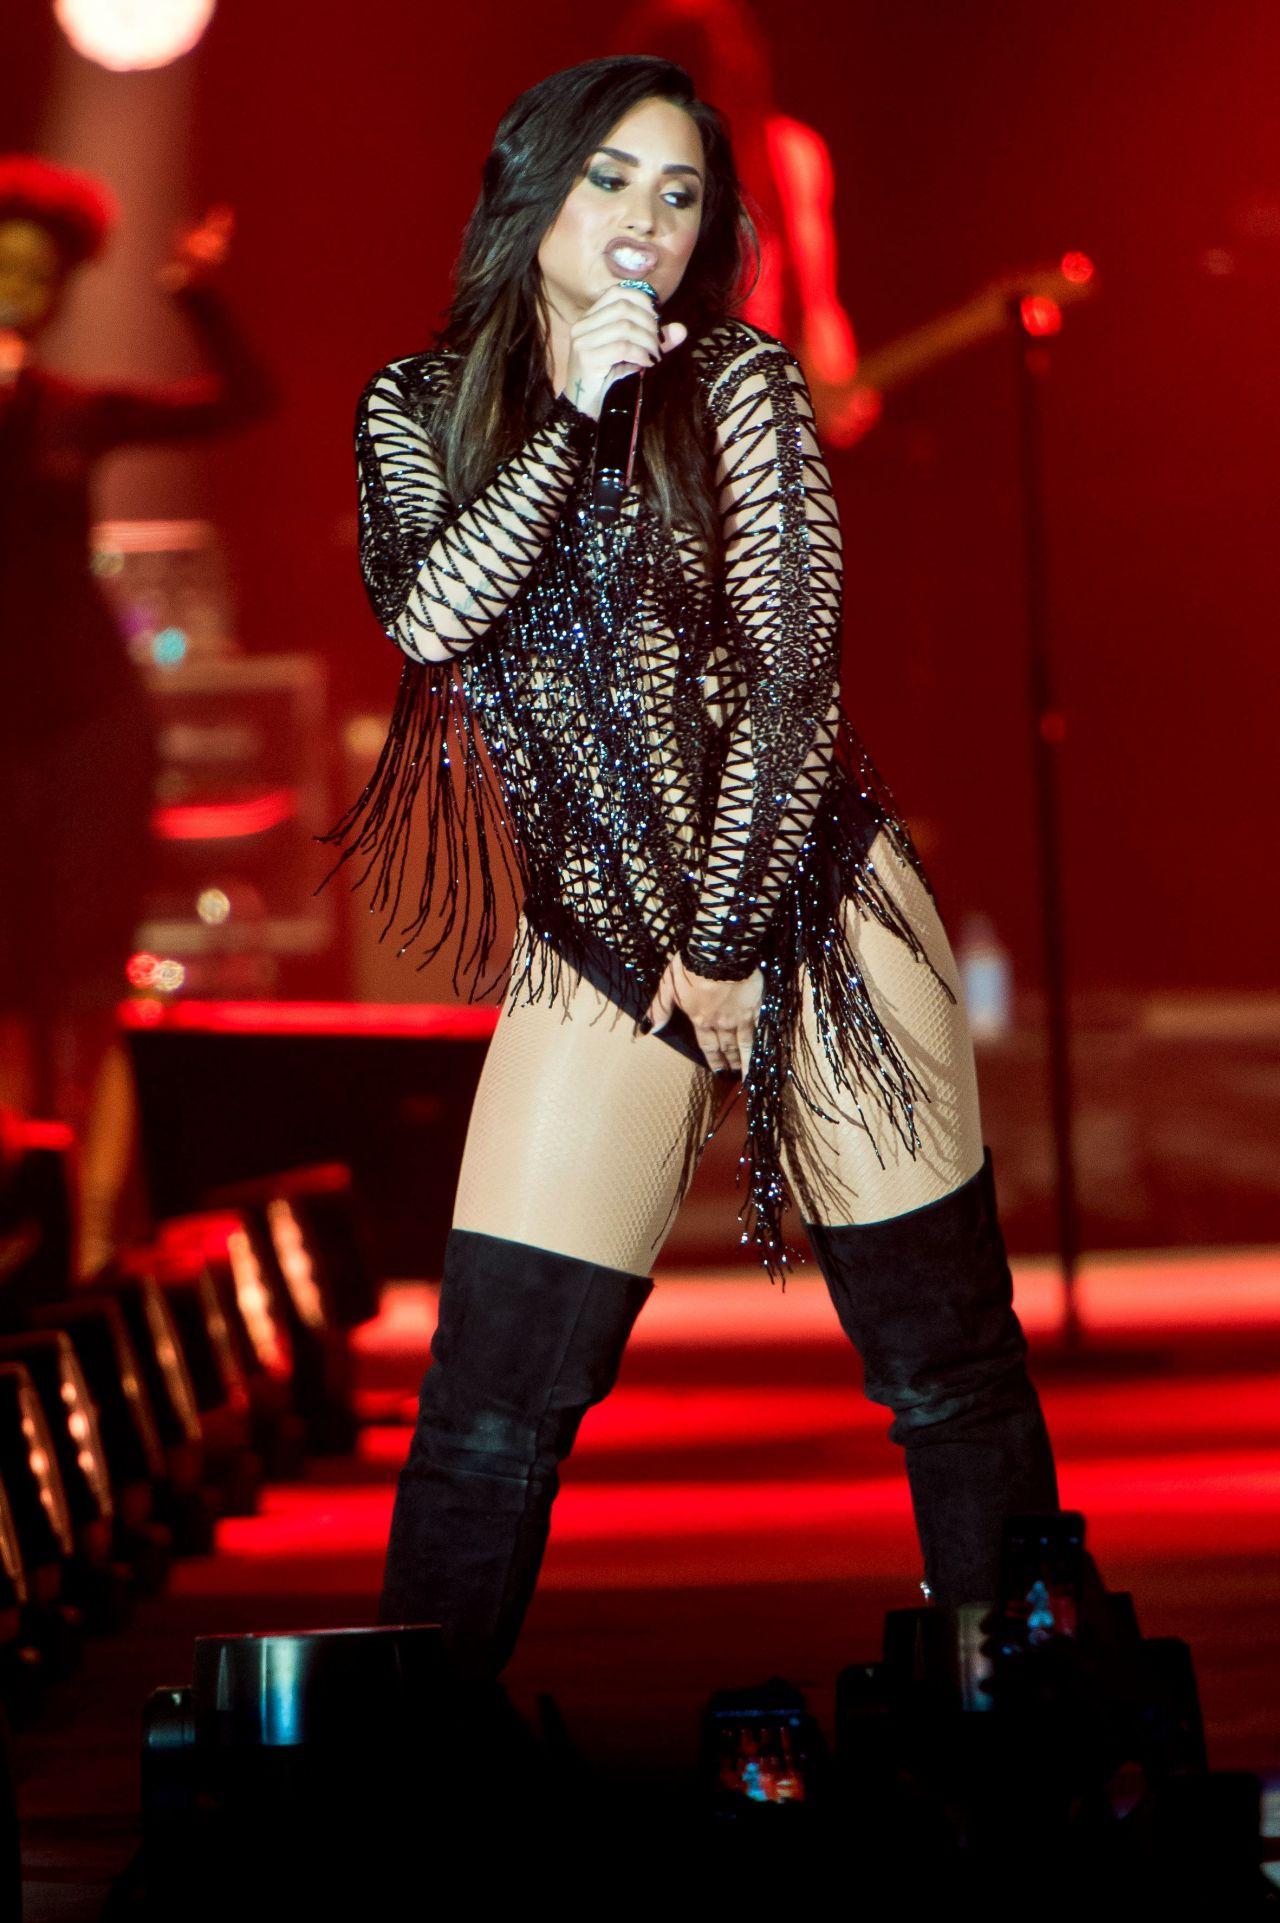 Demi Lovato - Performing at Redfestdxb Festival in Dubai 2 ...